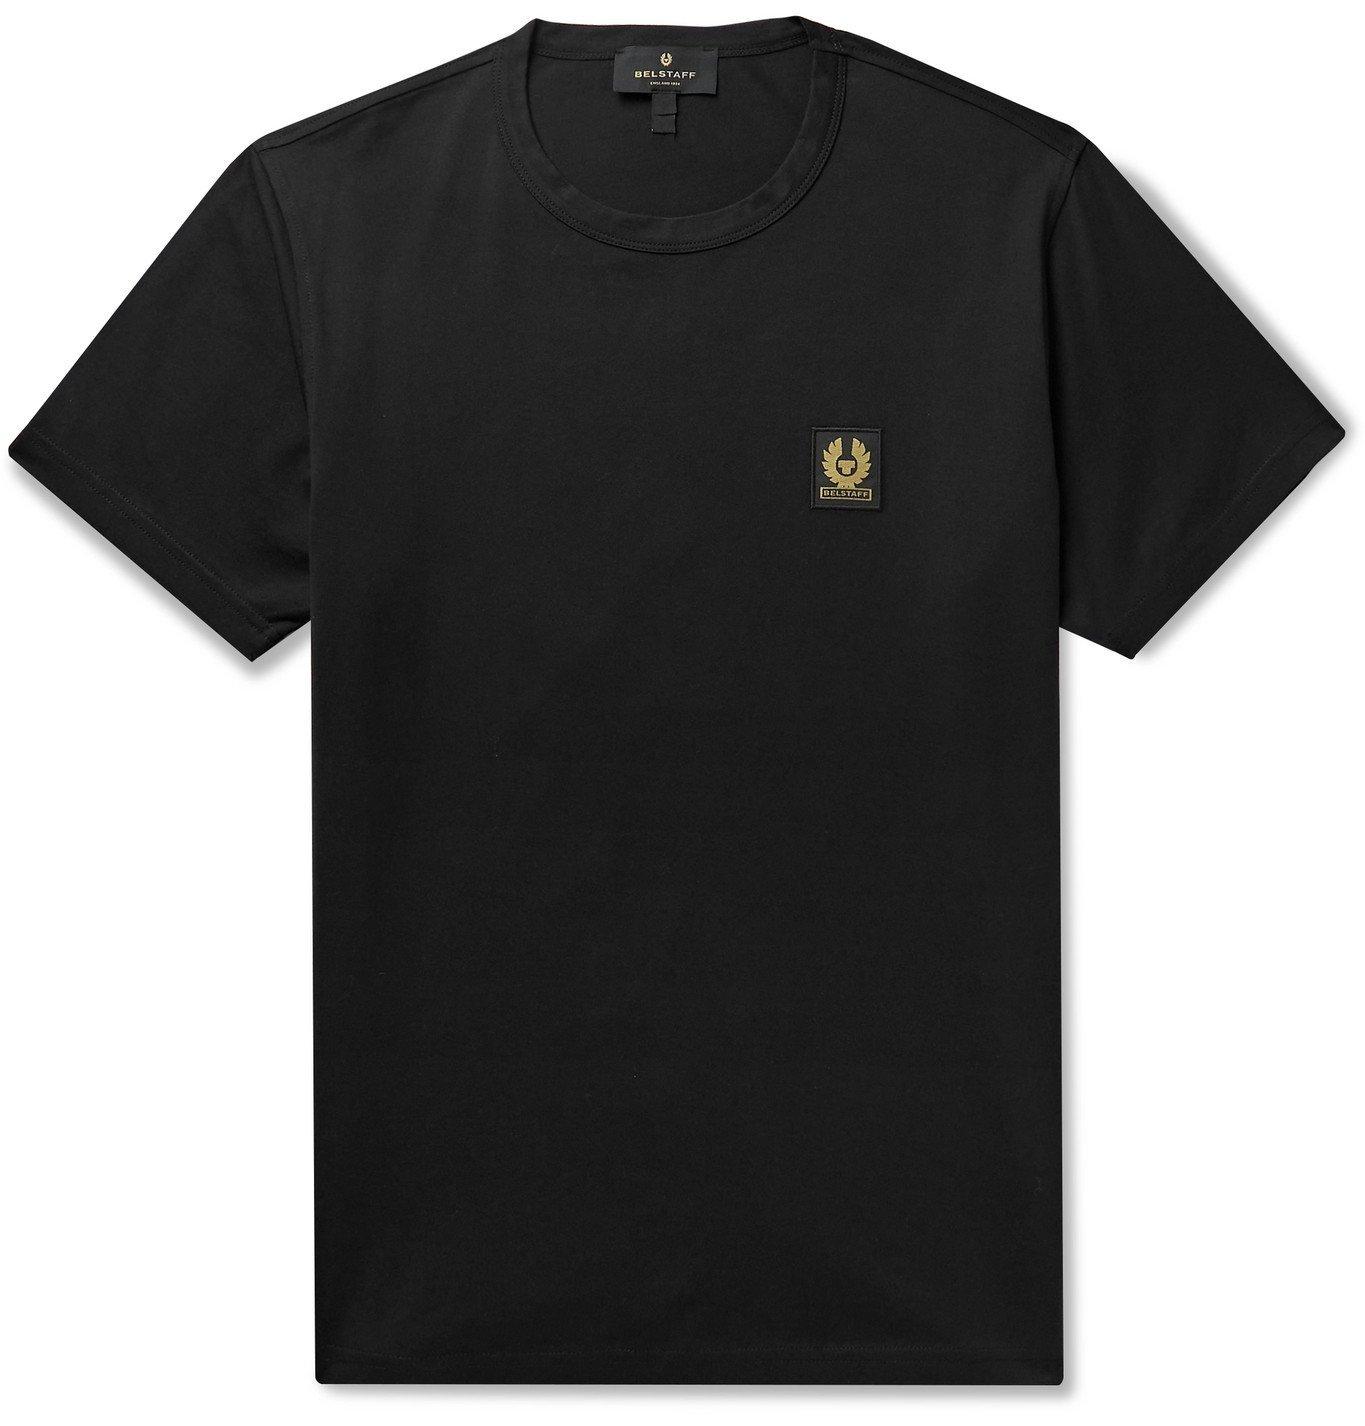 BELSTAFF - Slim-Fit Logo-Appliquéd Cotton-Jersey T-Shirt - Black